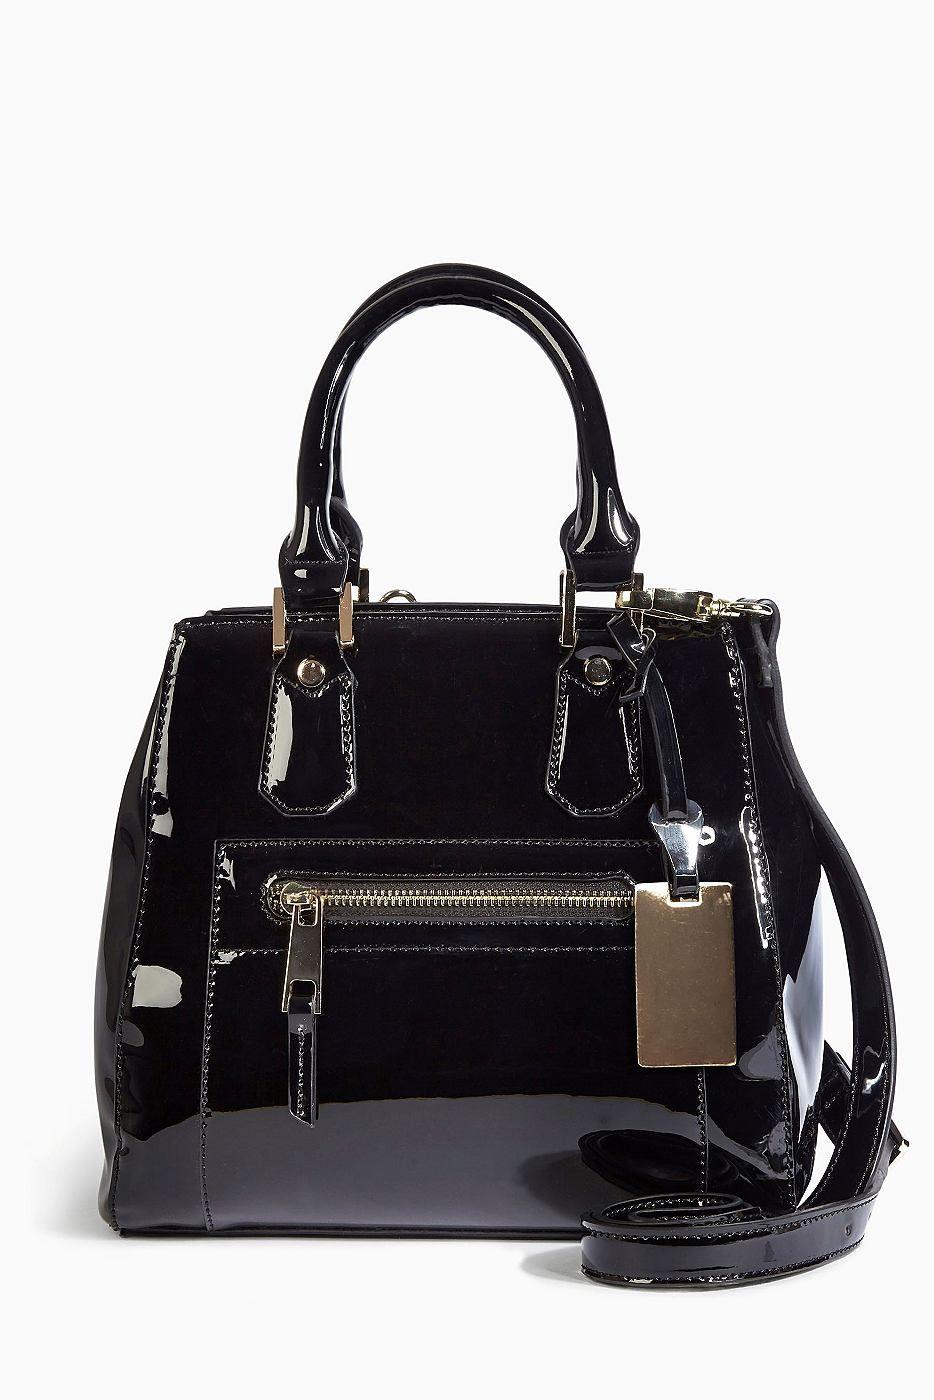 Mini-Handtasche:  100 % Polyurethan. Futter: 100% Polyester.  ...